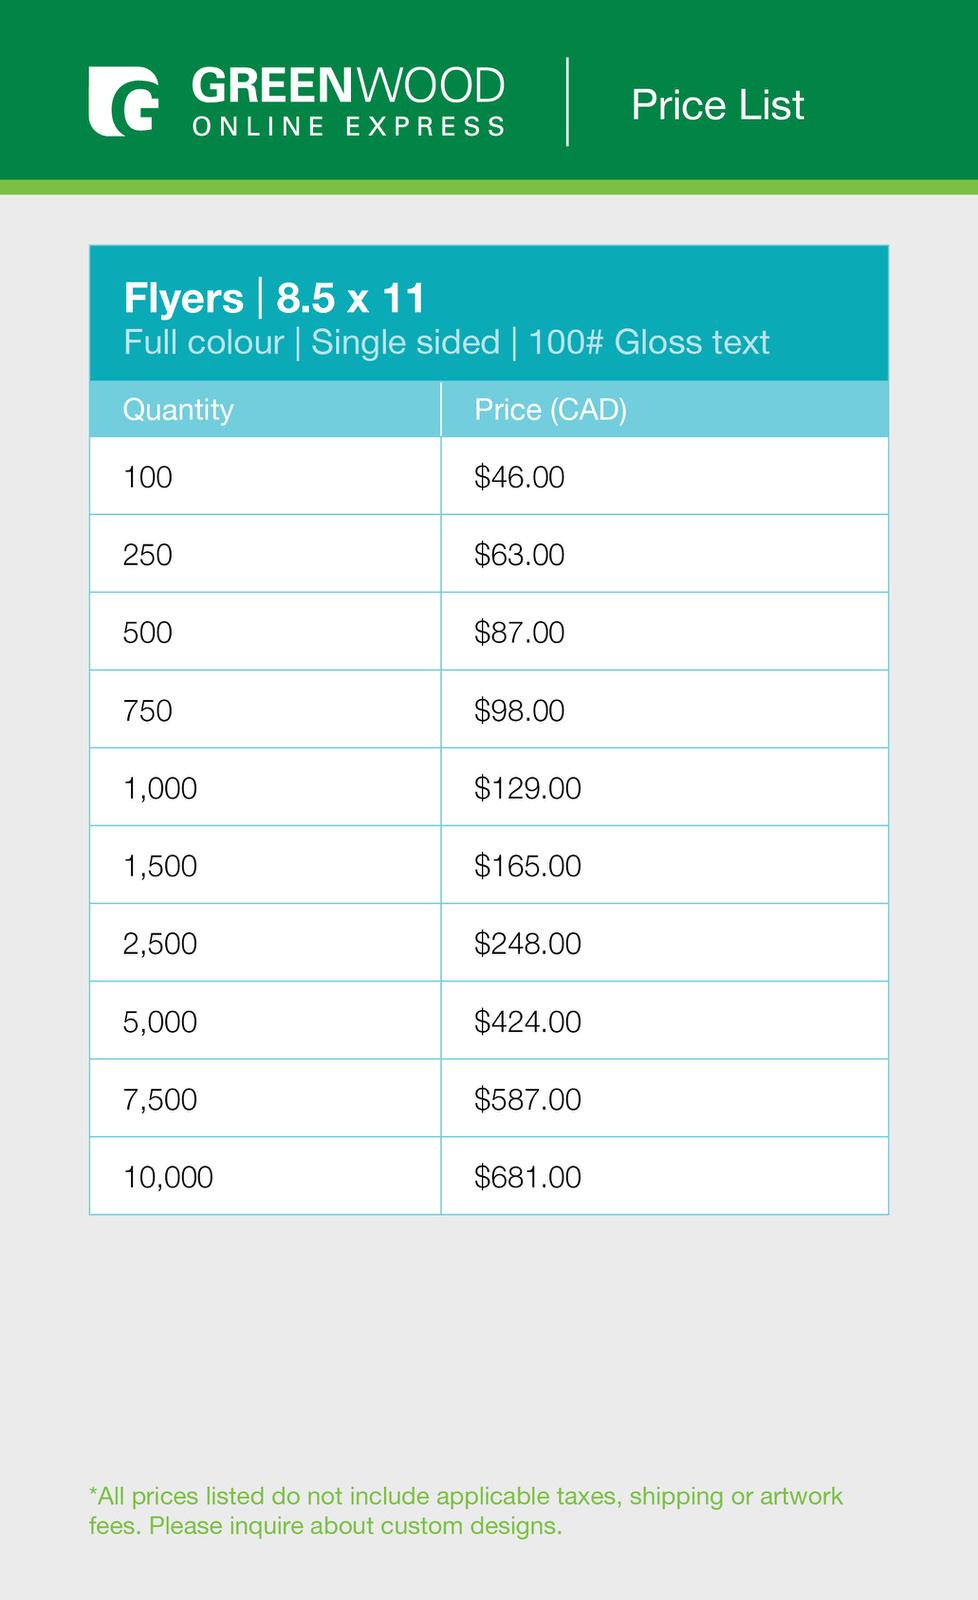 Greenwood flyers colour single sided price list.jpg